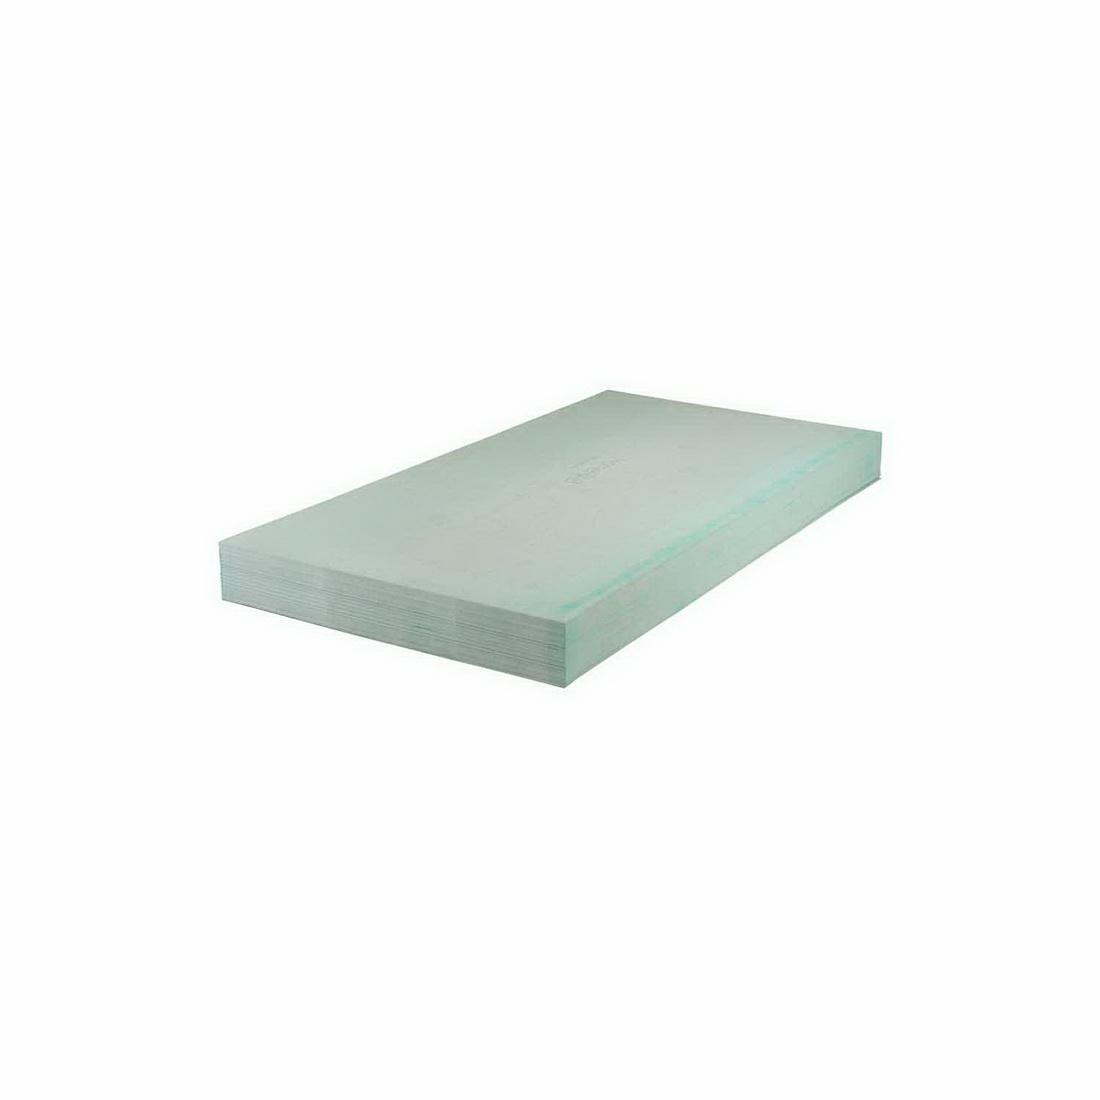 HomeRAB Fiber Cement Pre-Cladding Sheet 3000 x 1200 x 4.5mm